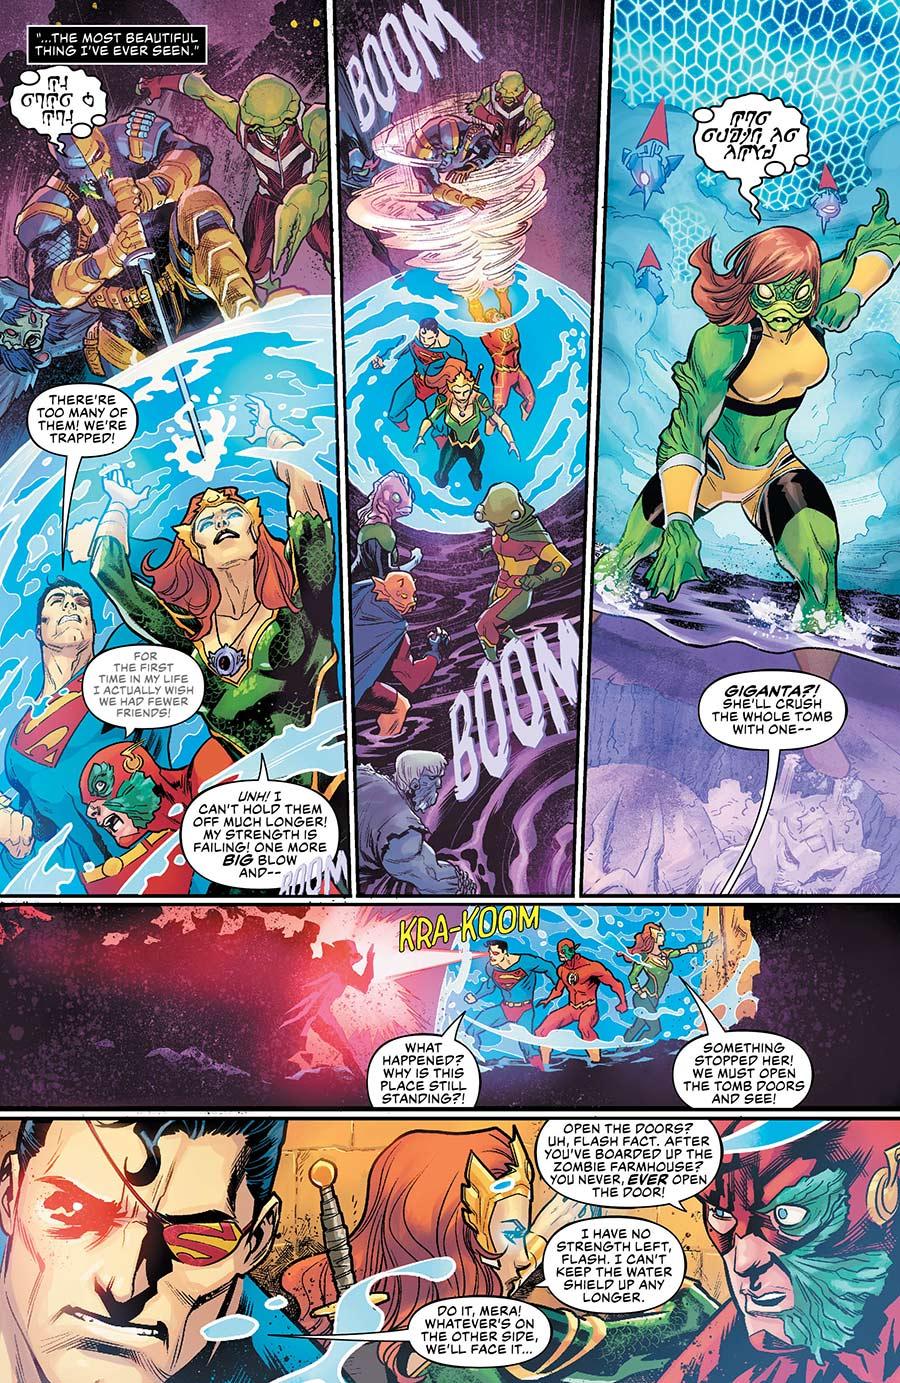 Aquaman Drowned Earth - 1-4 - DC Comics News